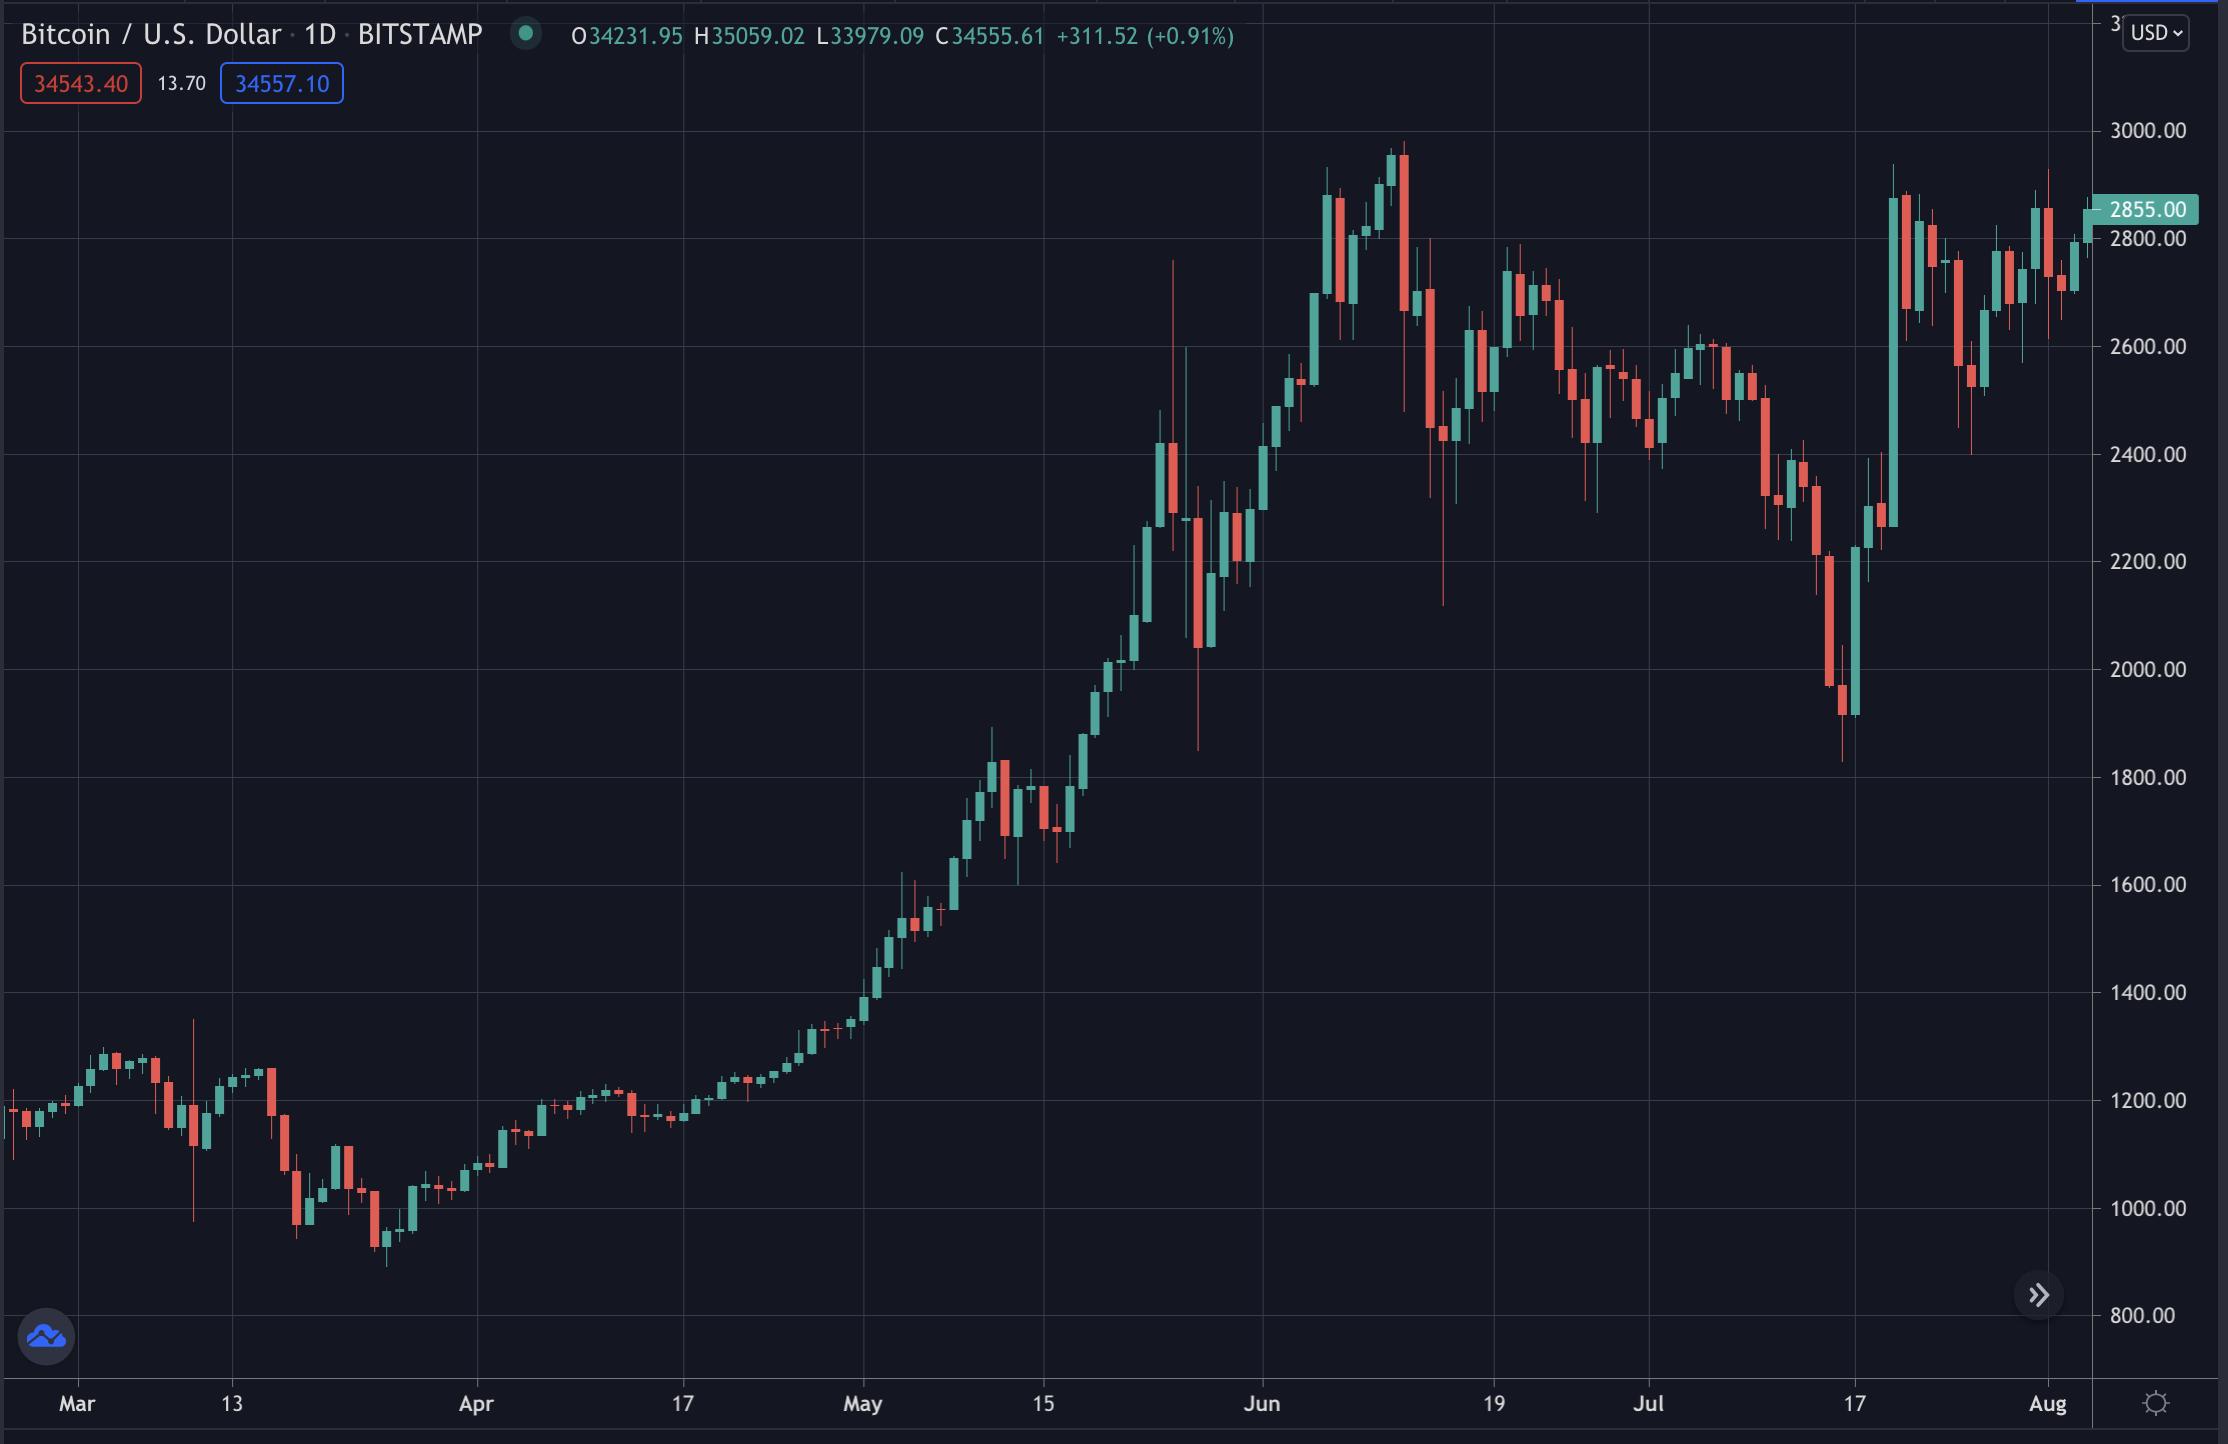 Bitcoin's price 2017